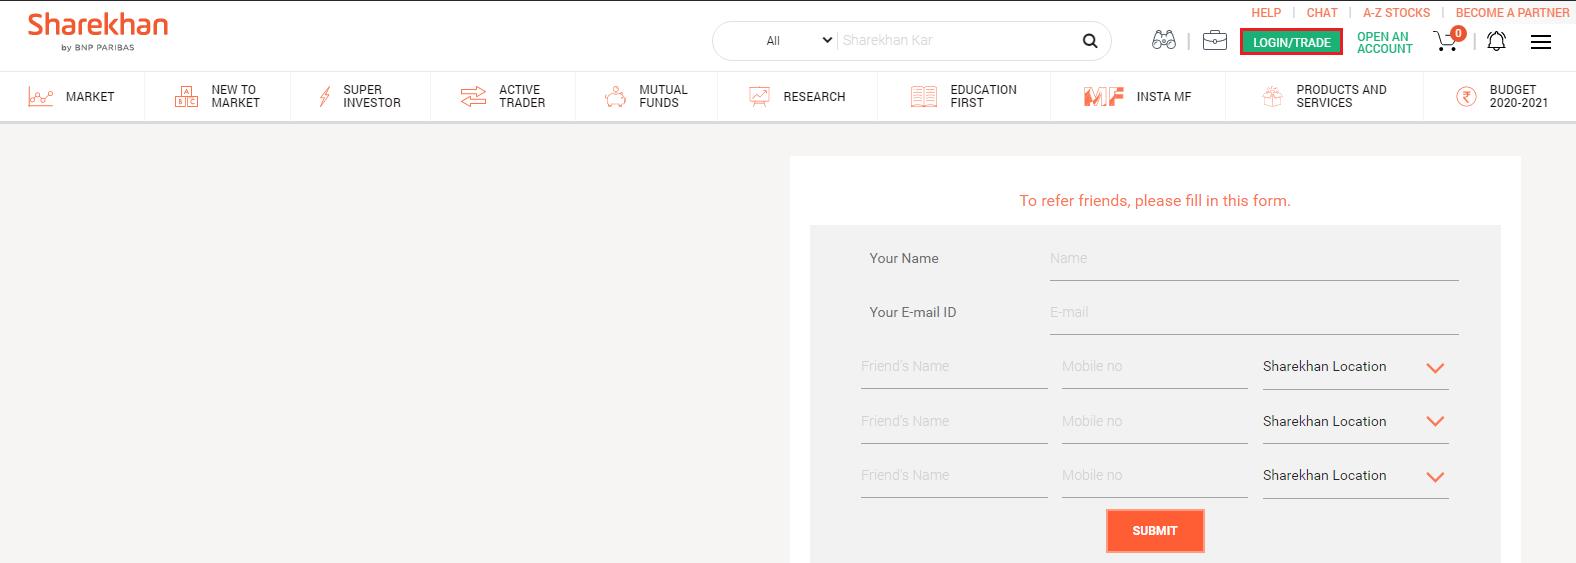 Sharekhan Homepage